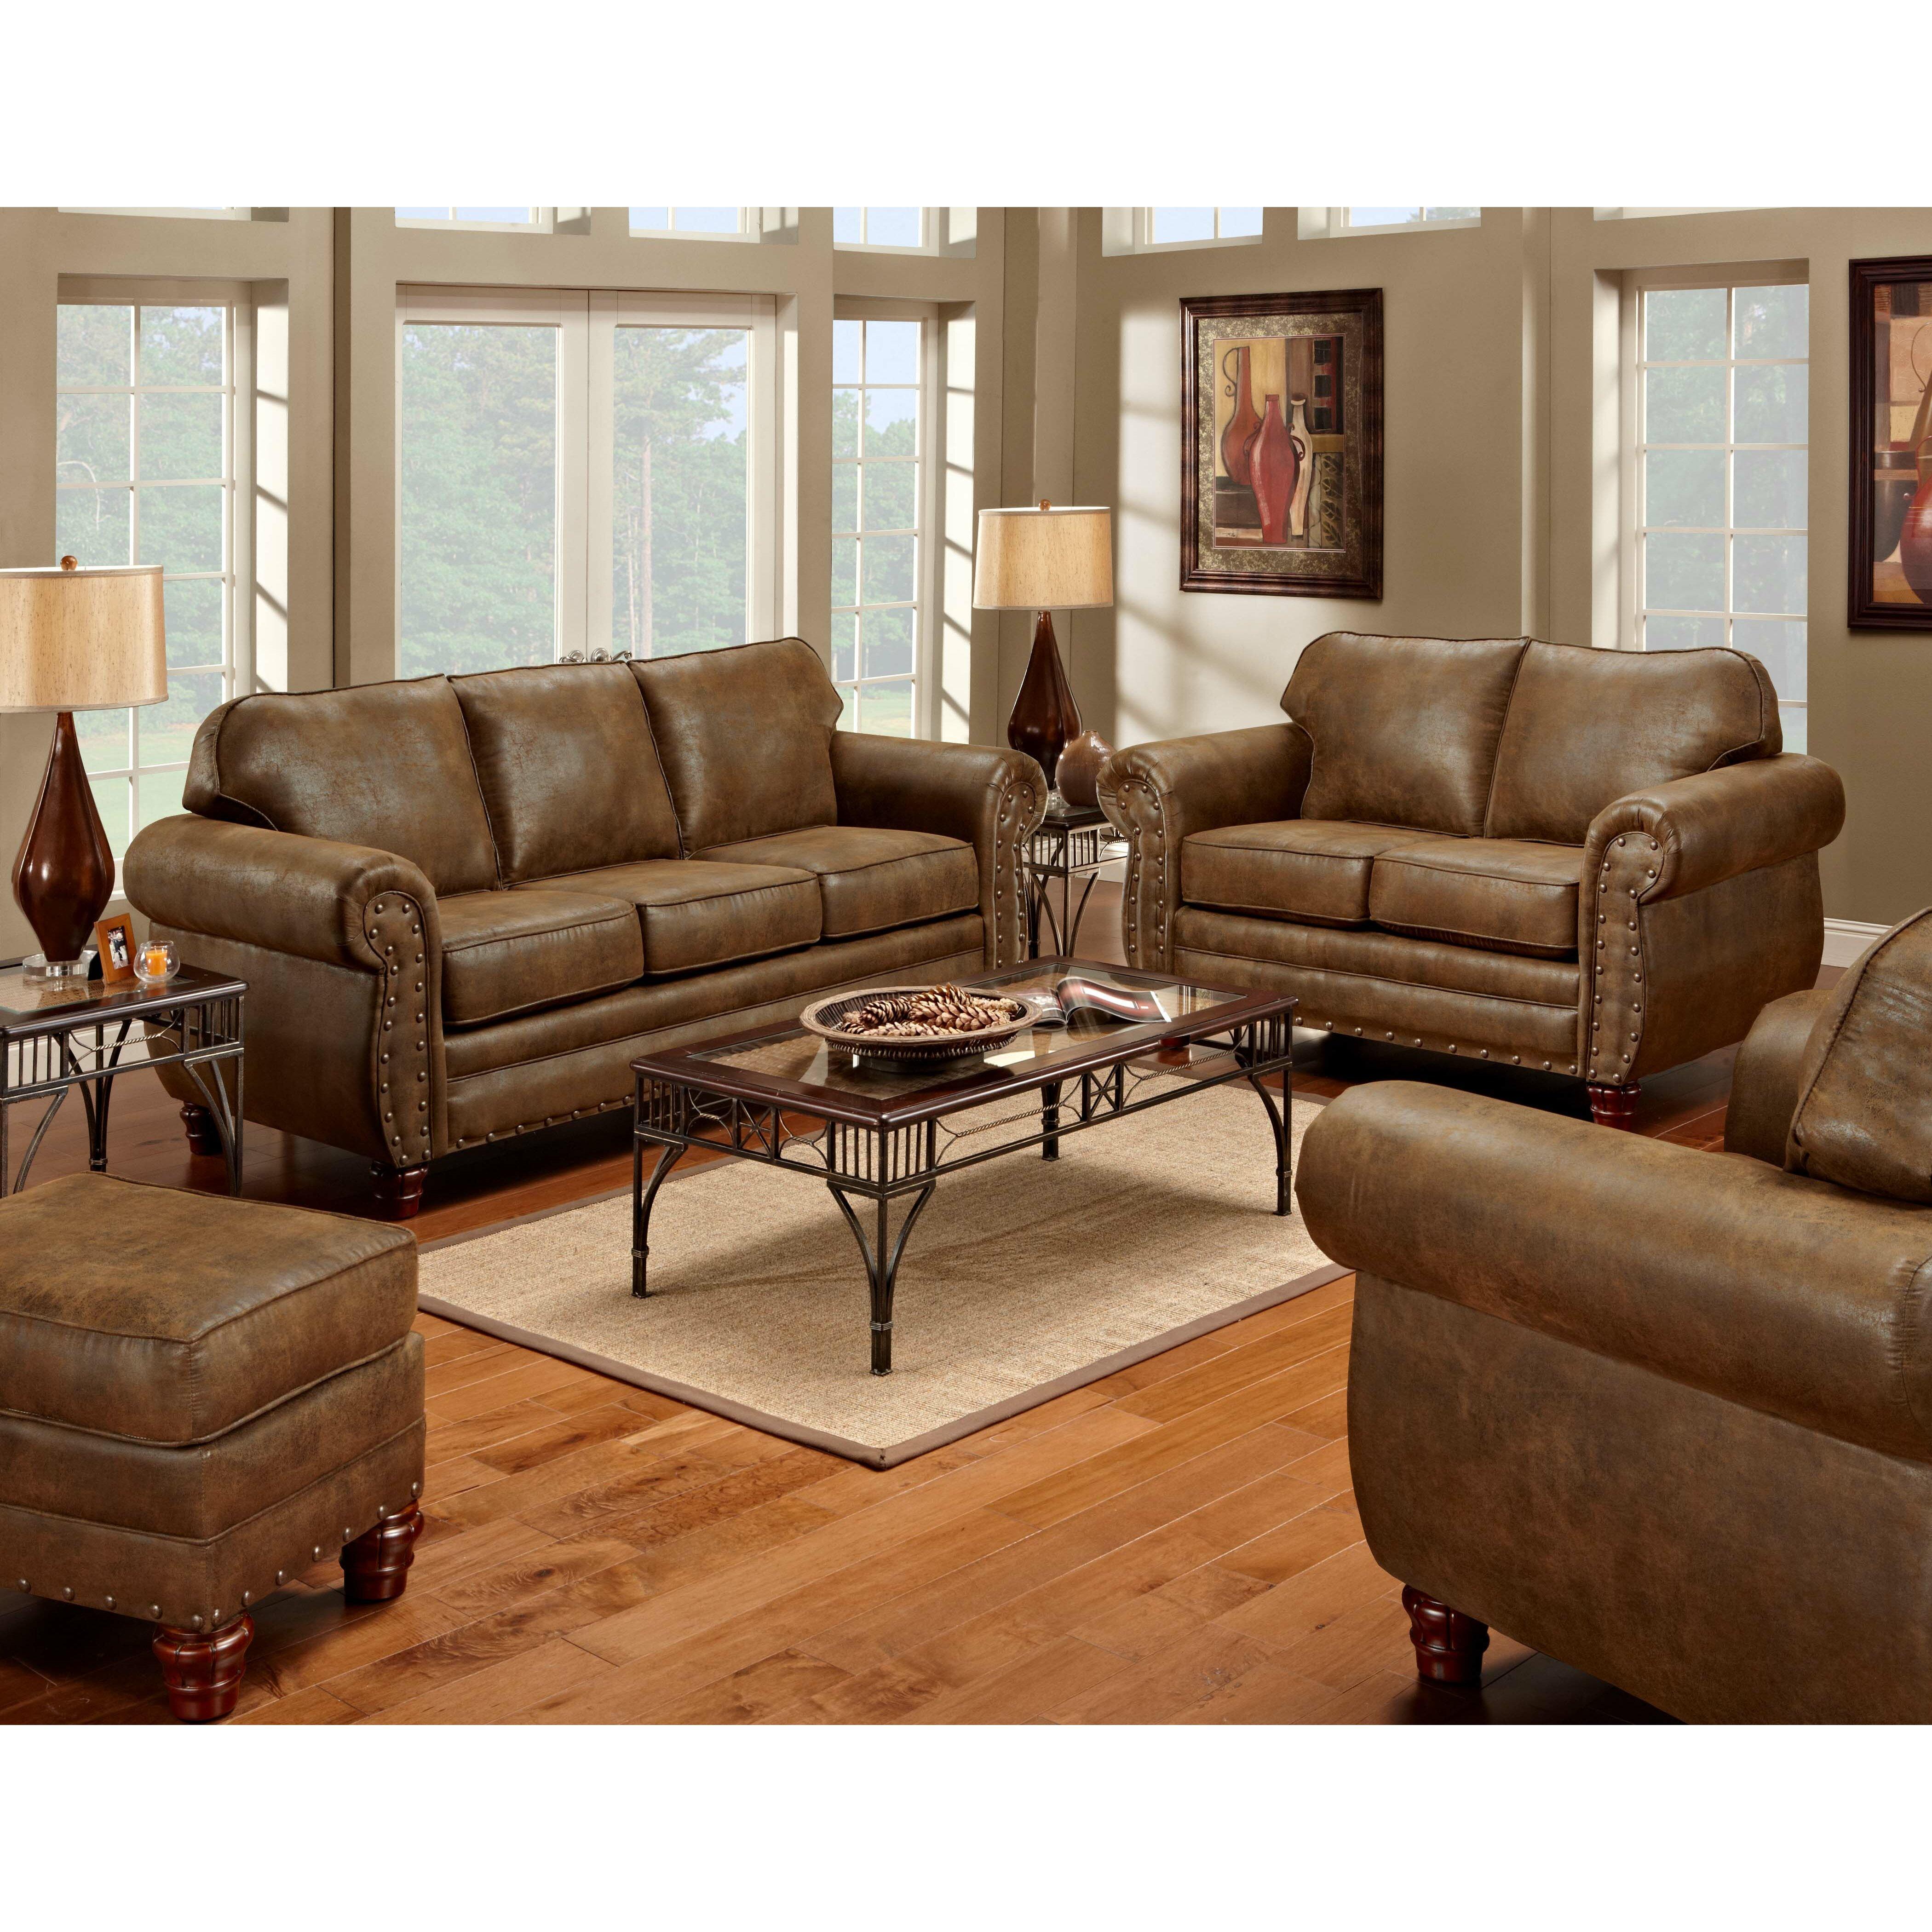 American furniture classics sedona 4 piece living room set with sleeper sofa